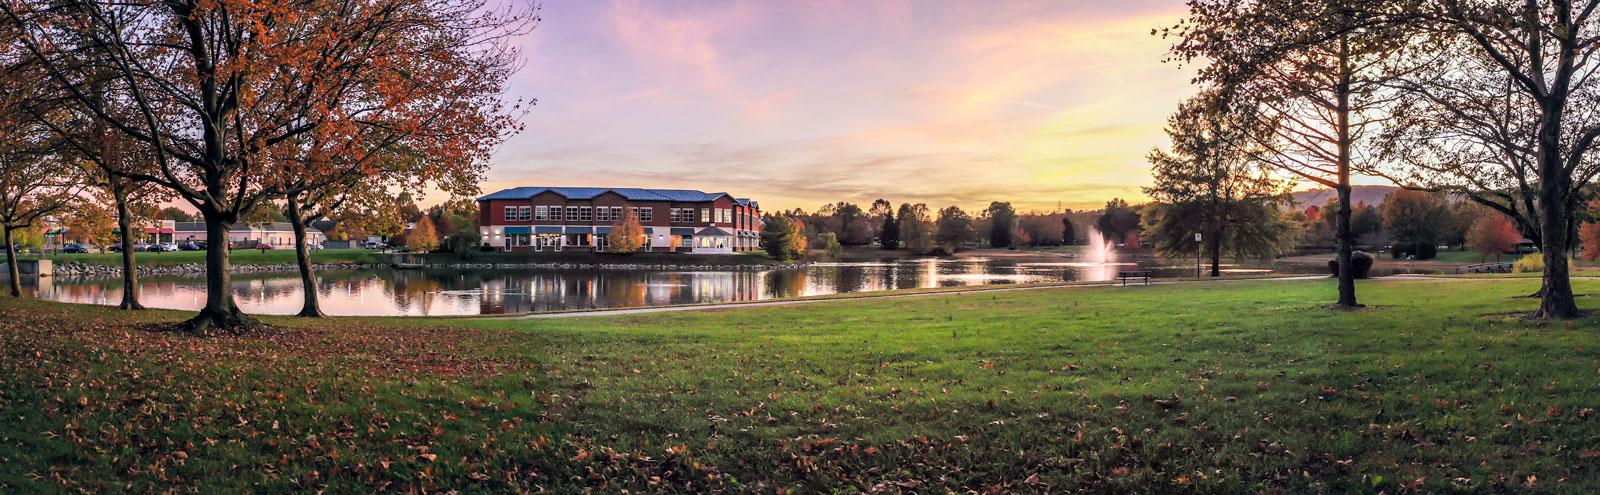 Ausherman Residential Property - Whittier lake